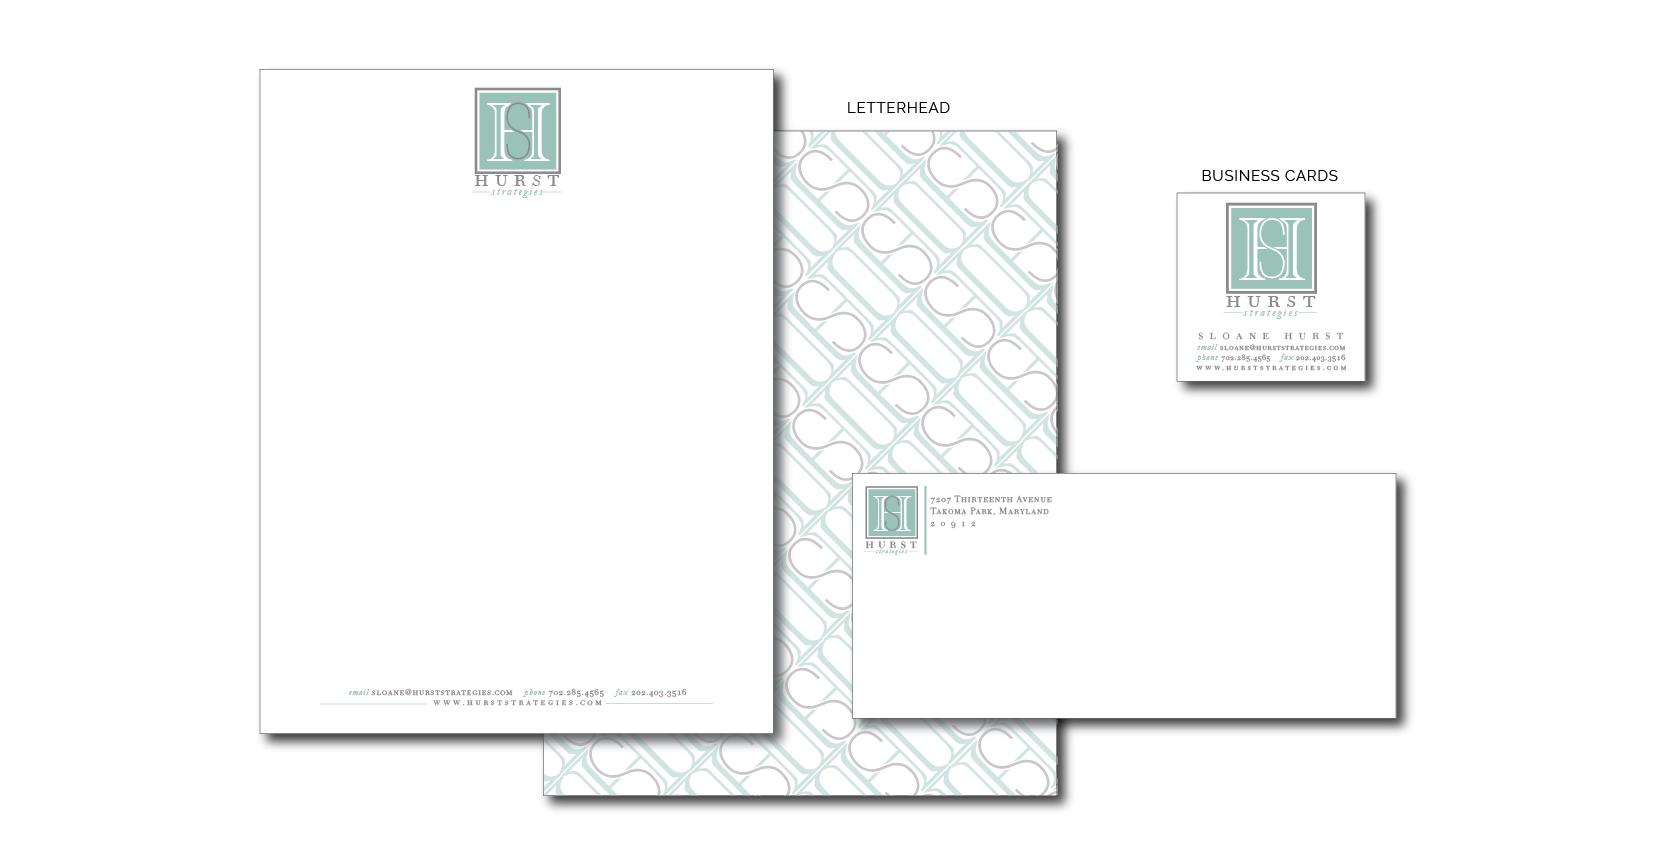 Hurst-Strategies-Letterhead-01